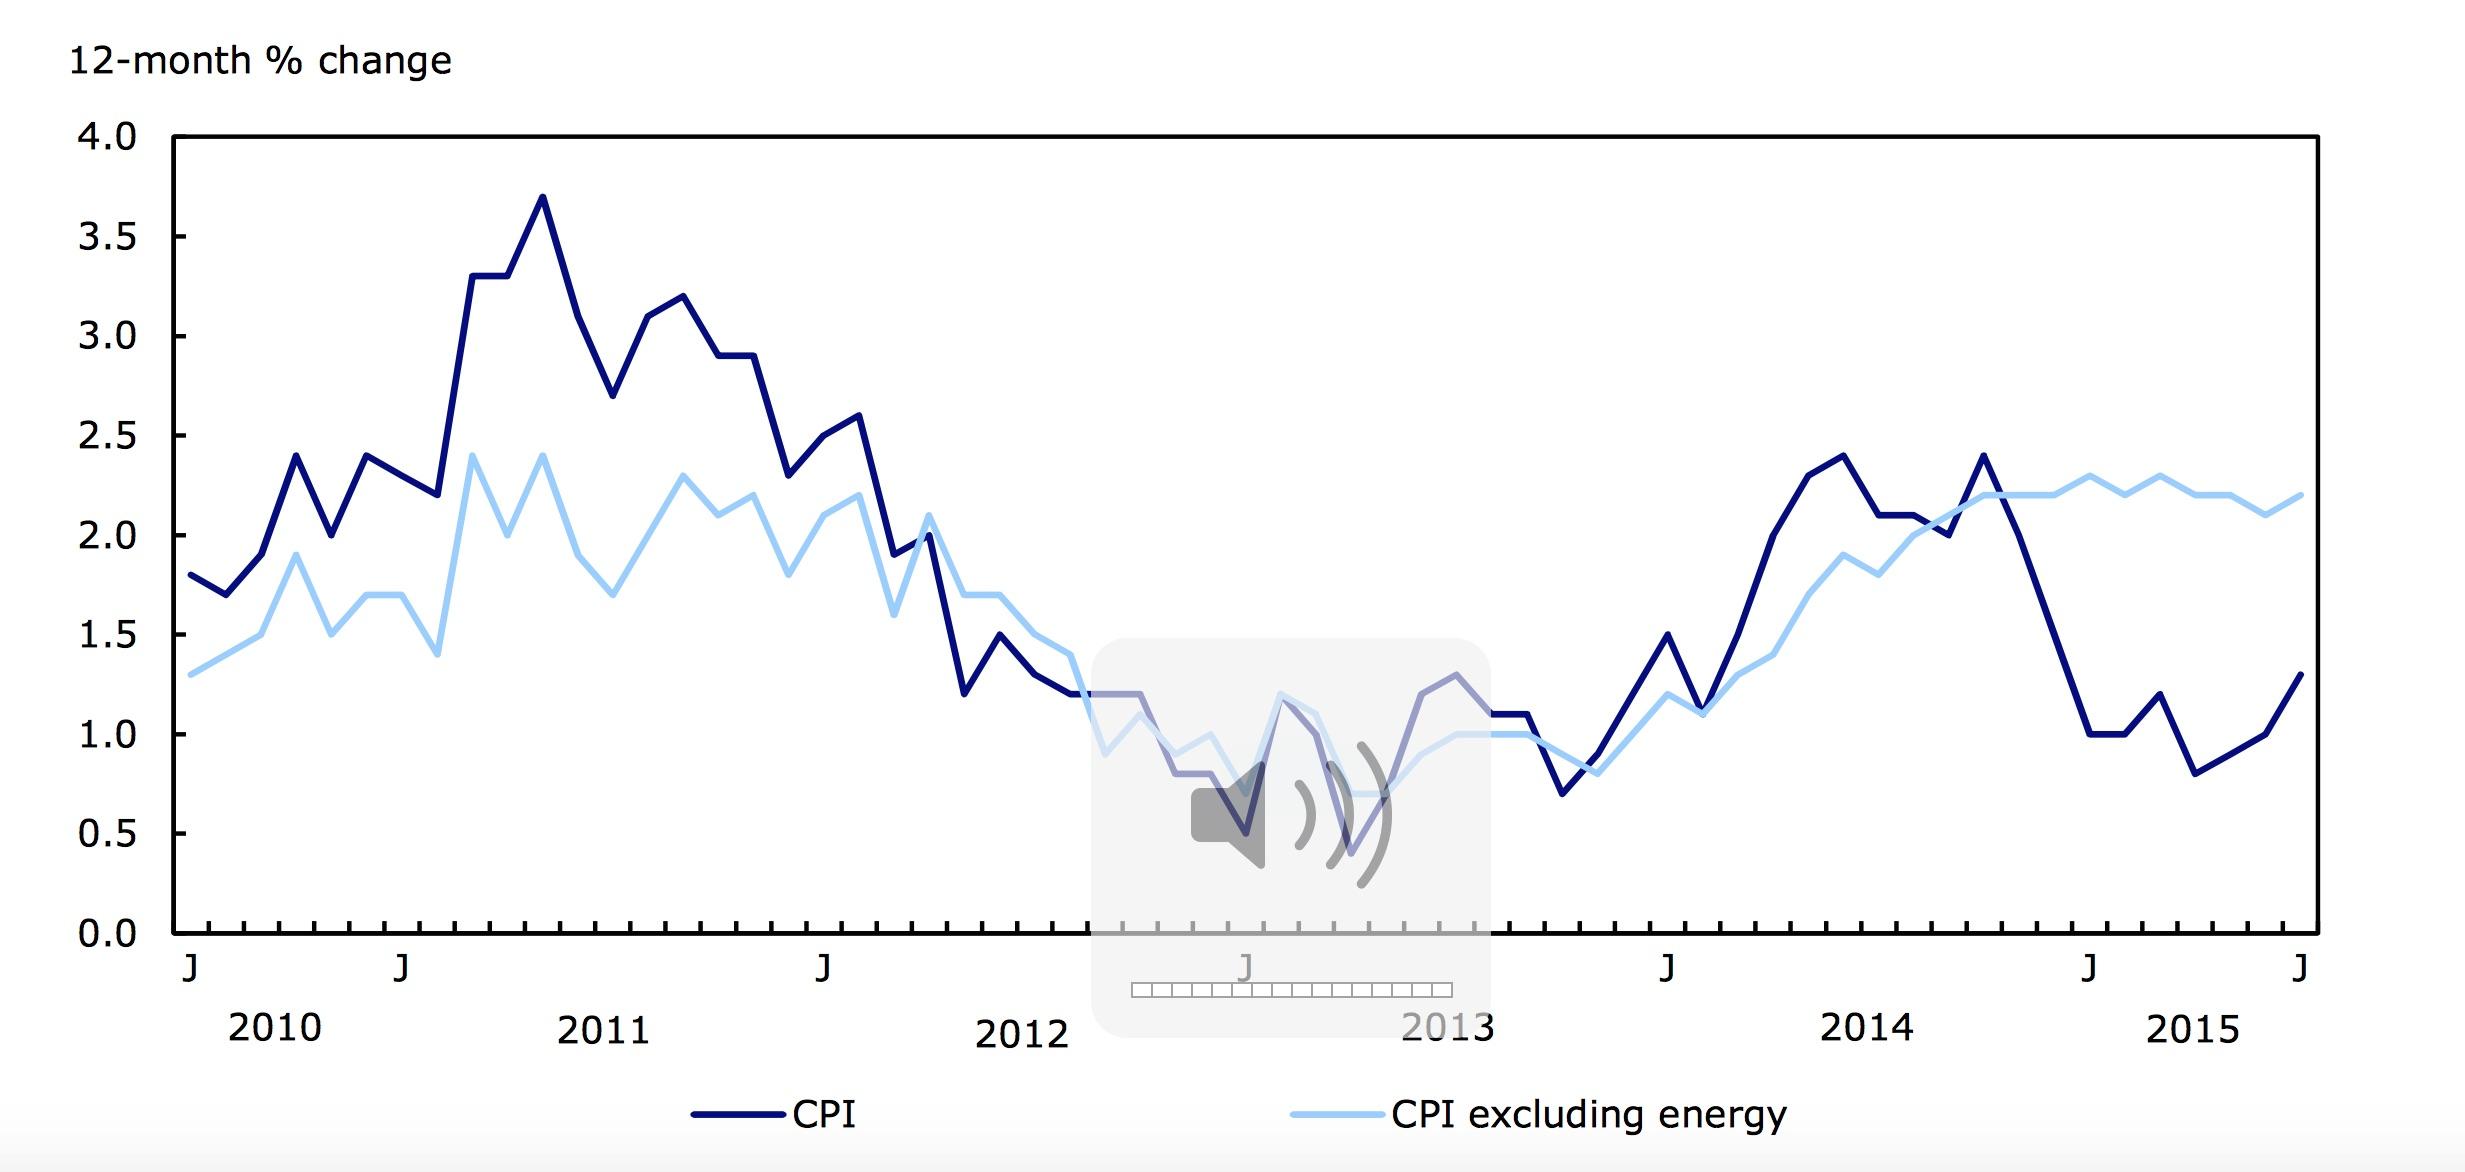 inflation remains lacklustre in july